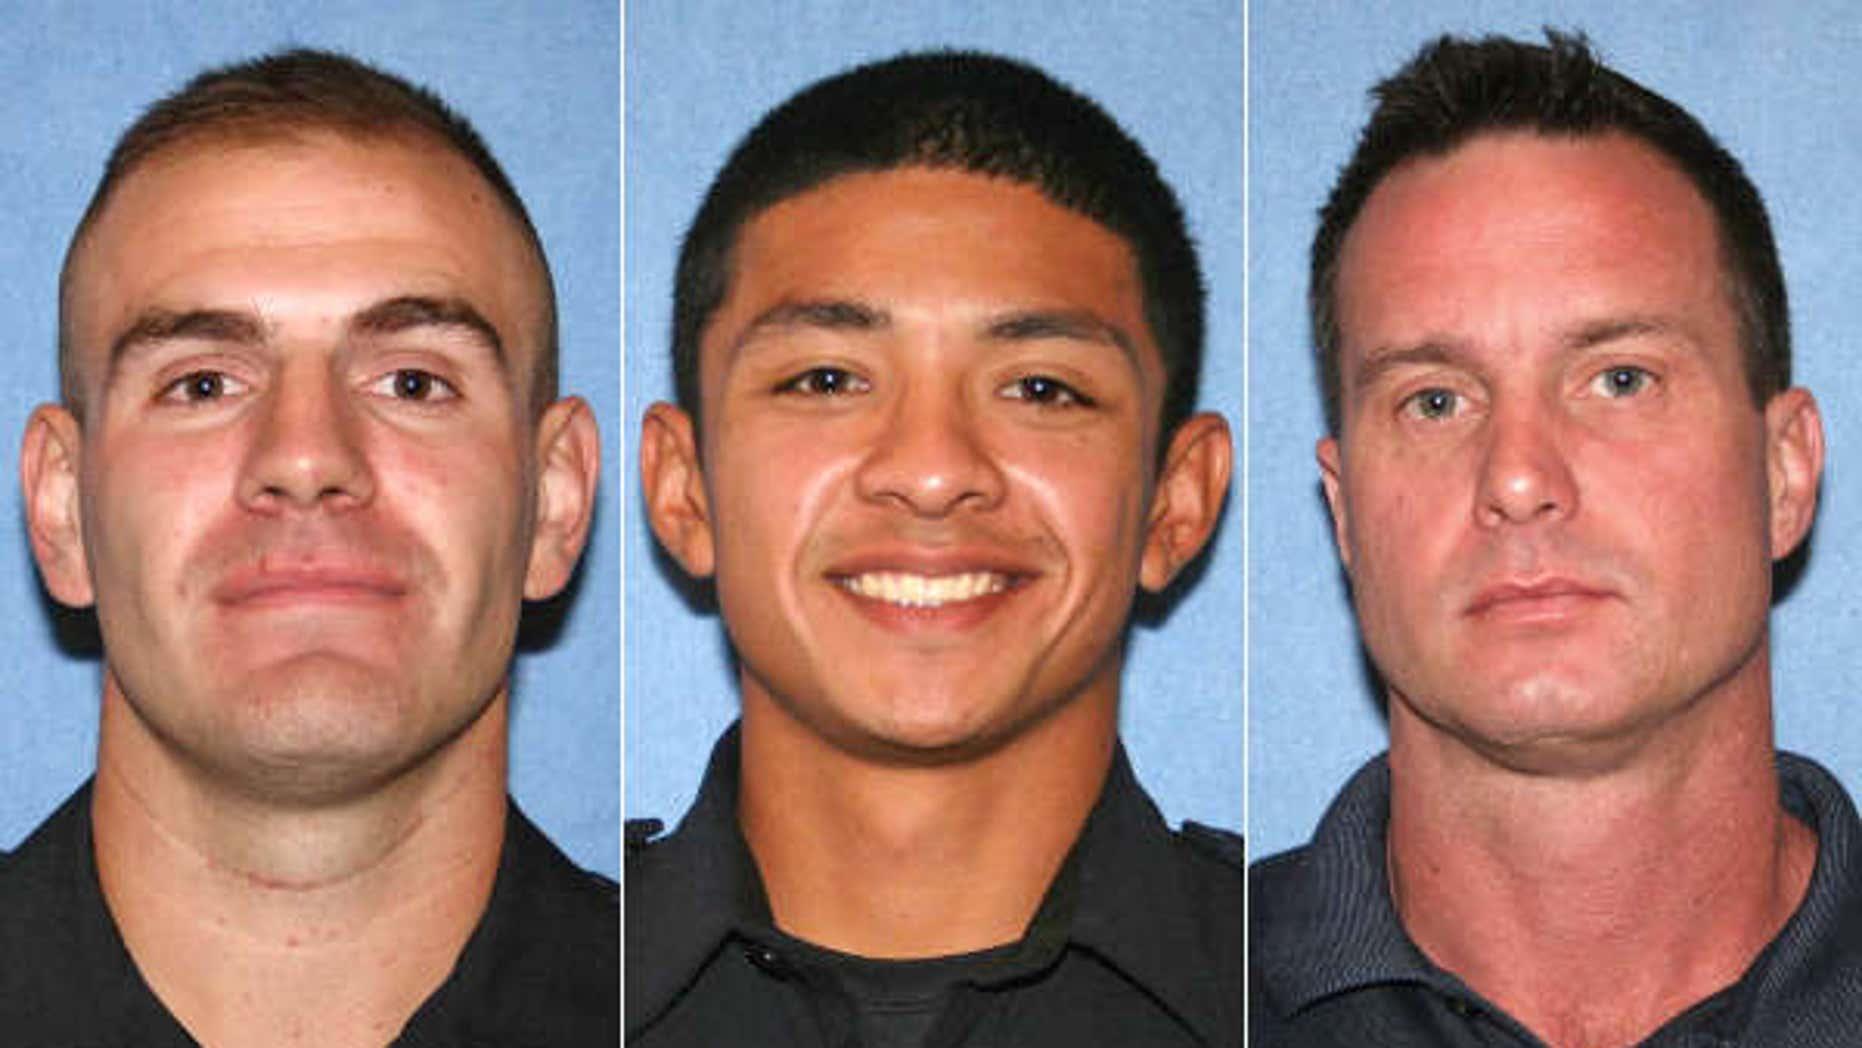 Phoenix officers left to right: Michael J. Carnicle, Richard G. Pina and Jason E. McFadden.